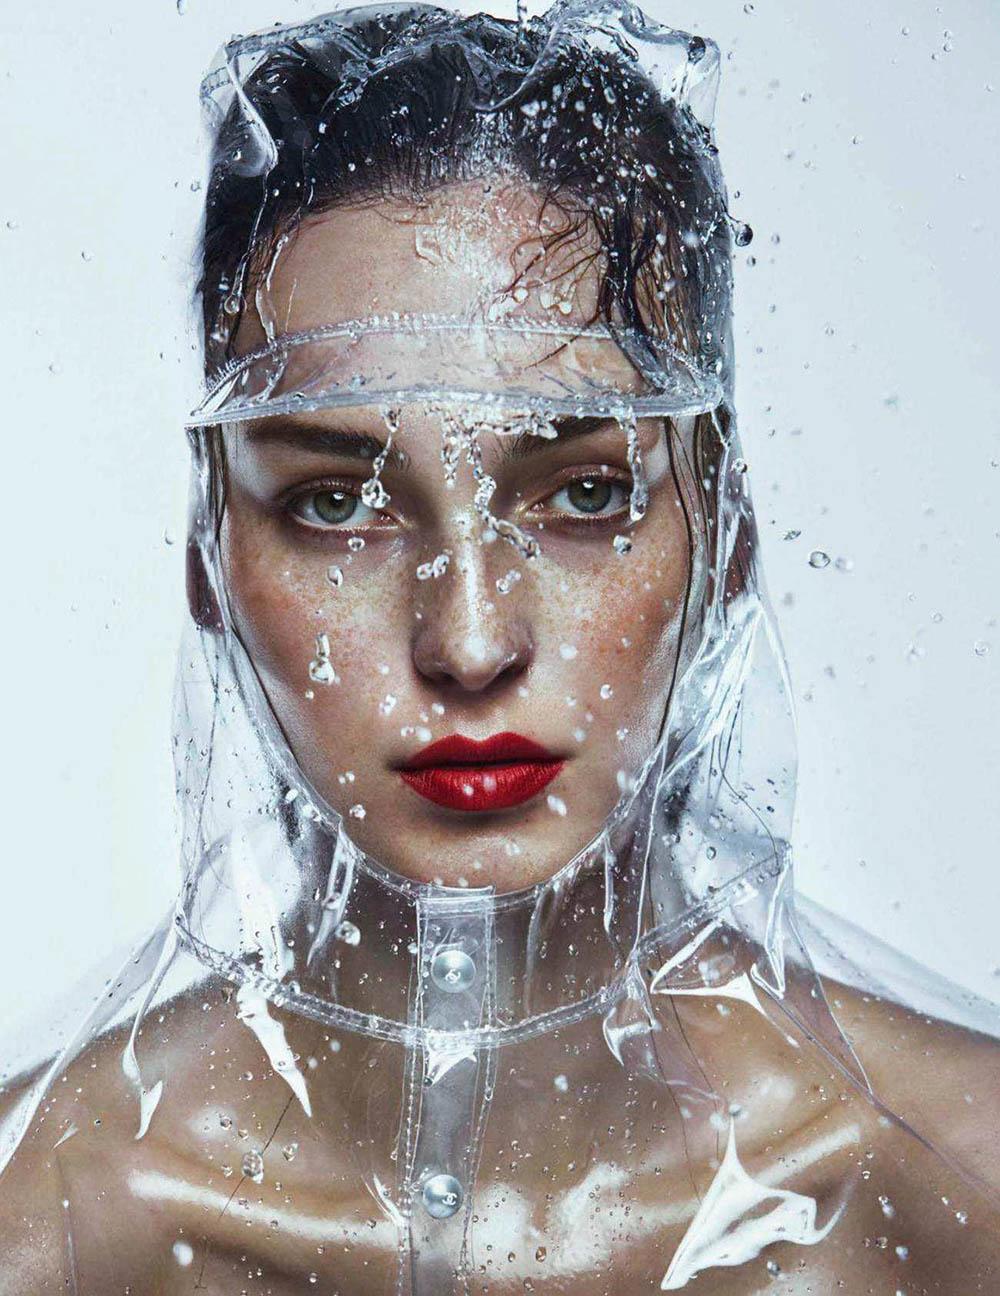 Julia Bergshoeff by Txema Yeste for Vogue Spain June 2018